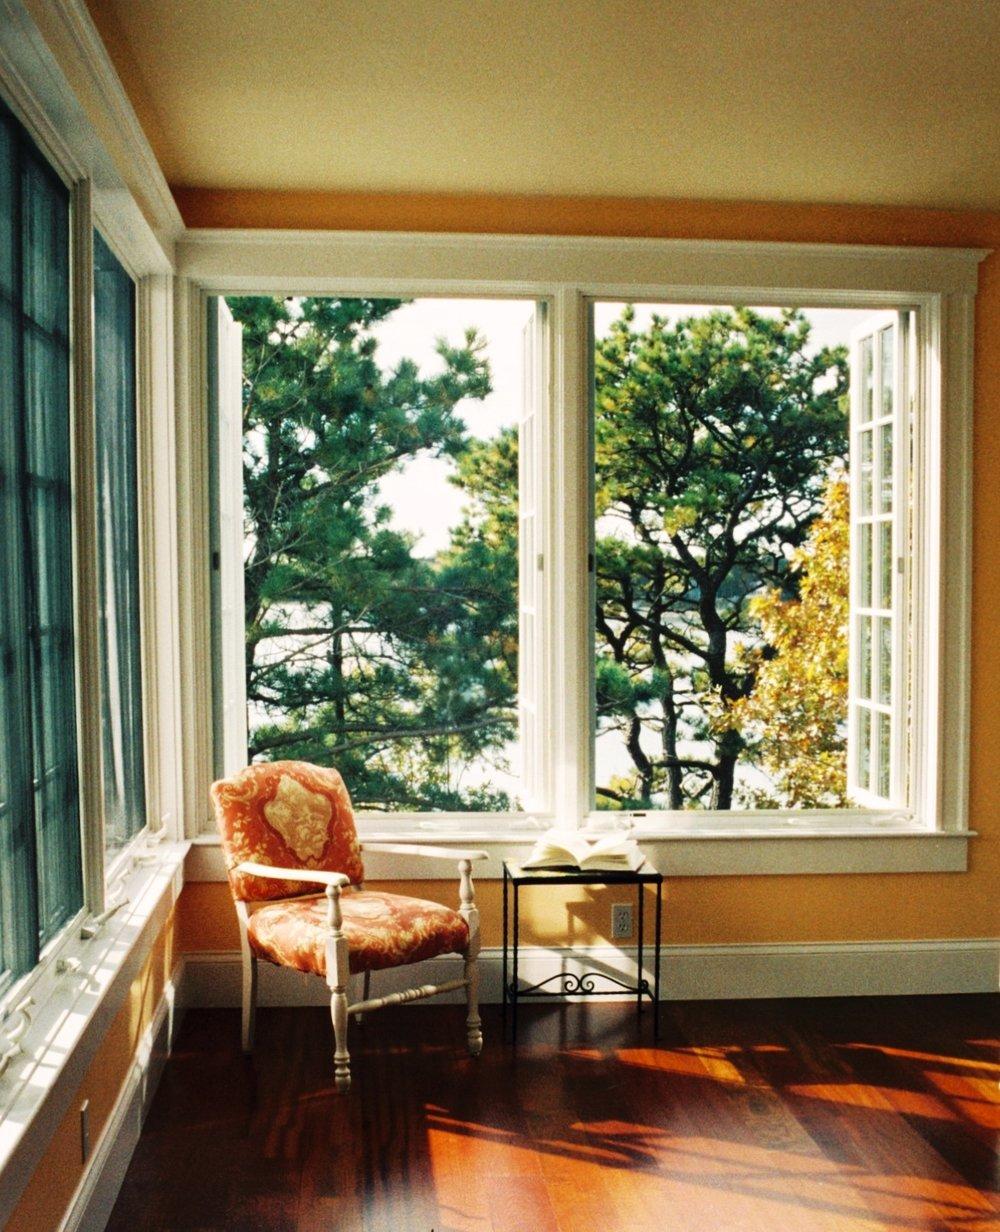 Robertson-Sunroom.jpg